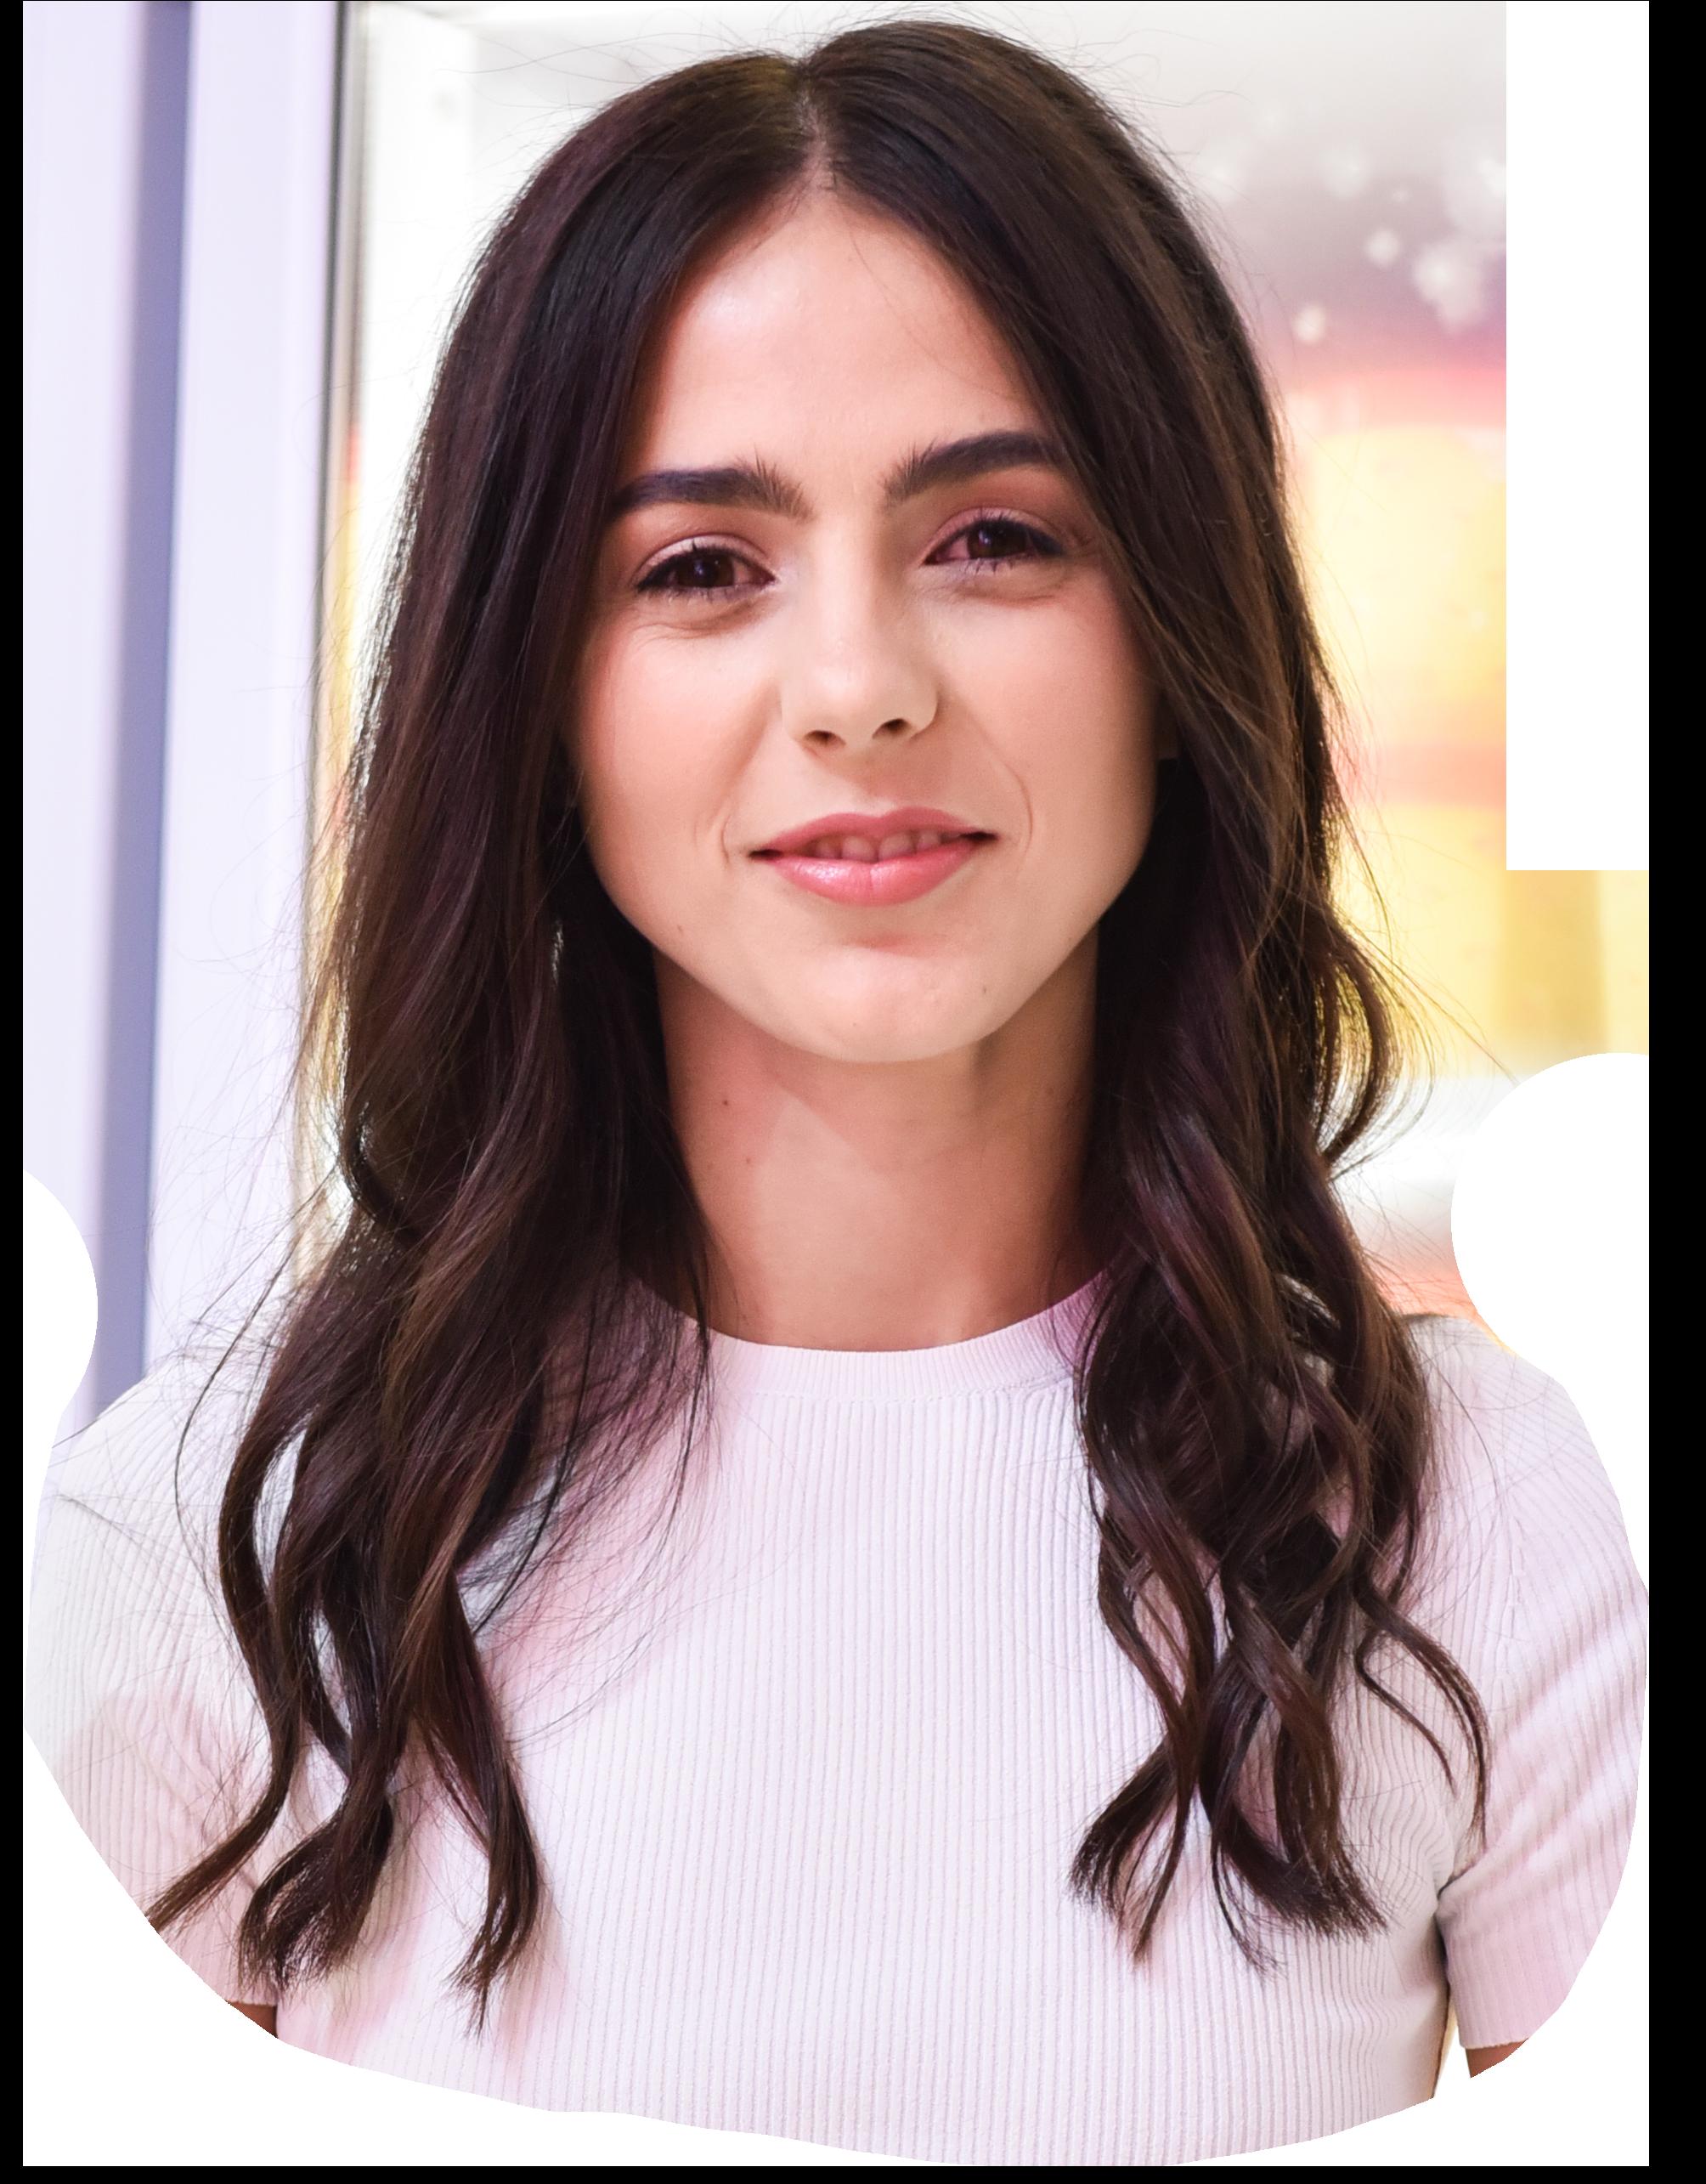 Maryellis Bunn Profile Pic